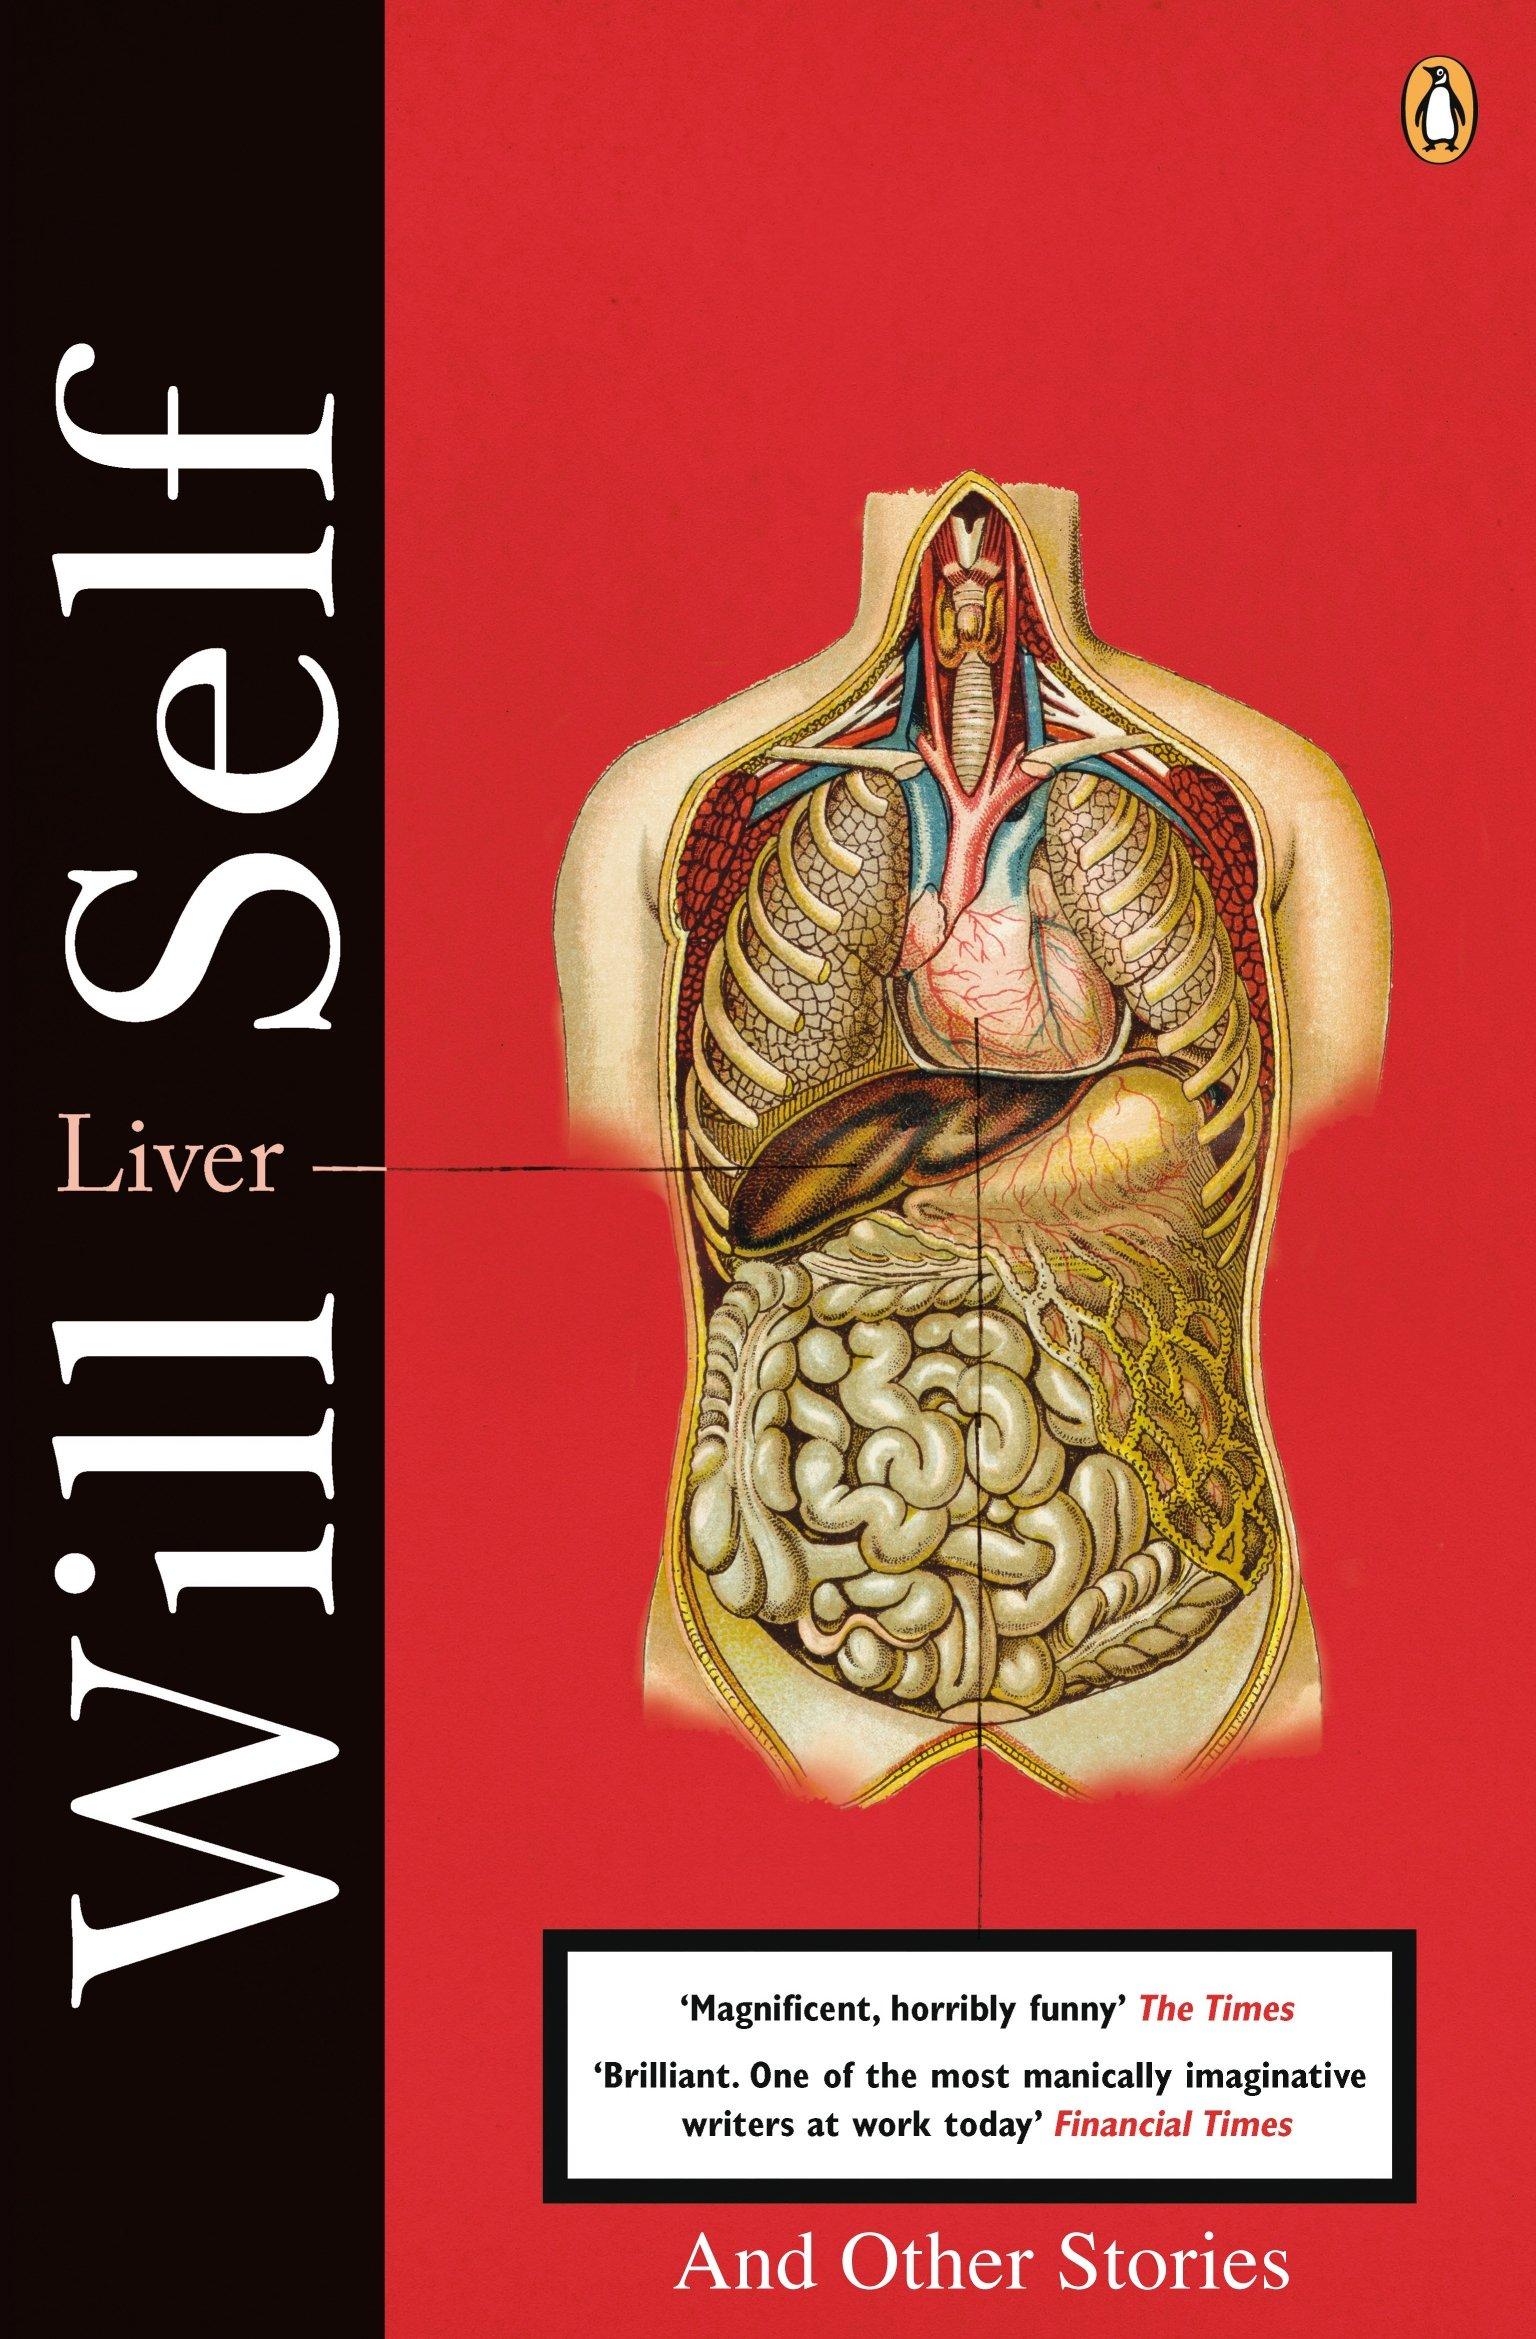 Liver: And Other Stories: Amazon.es: Will Self: Libros en idiomas extranjeros